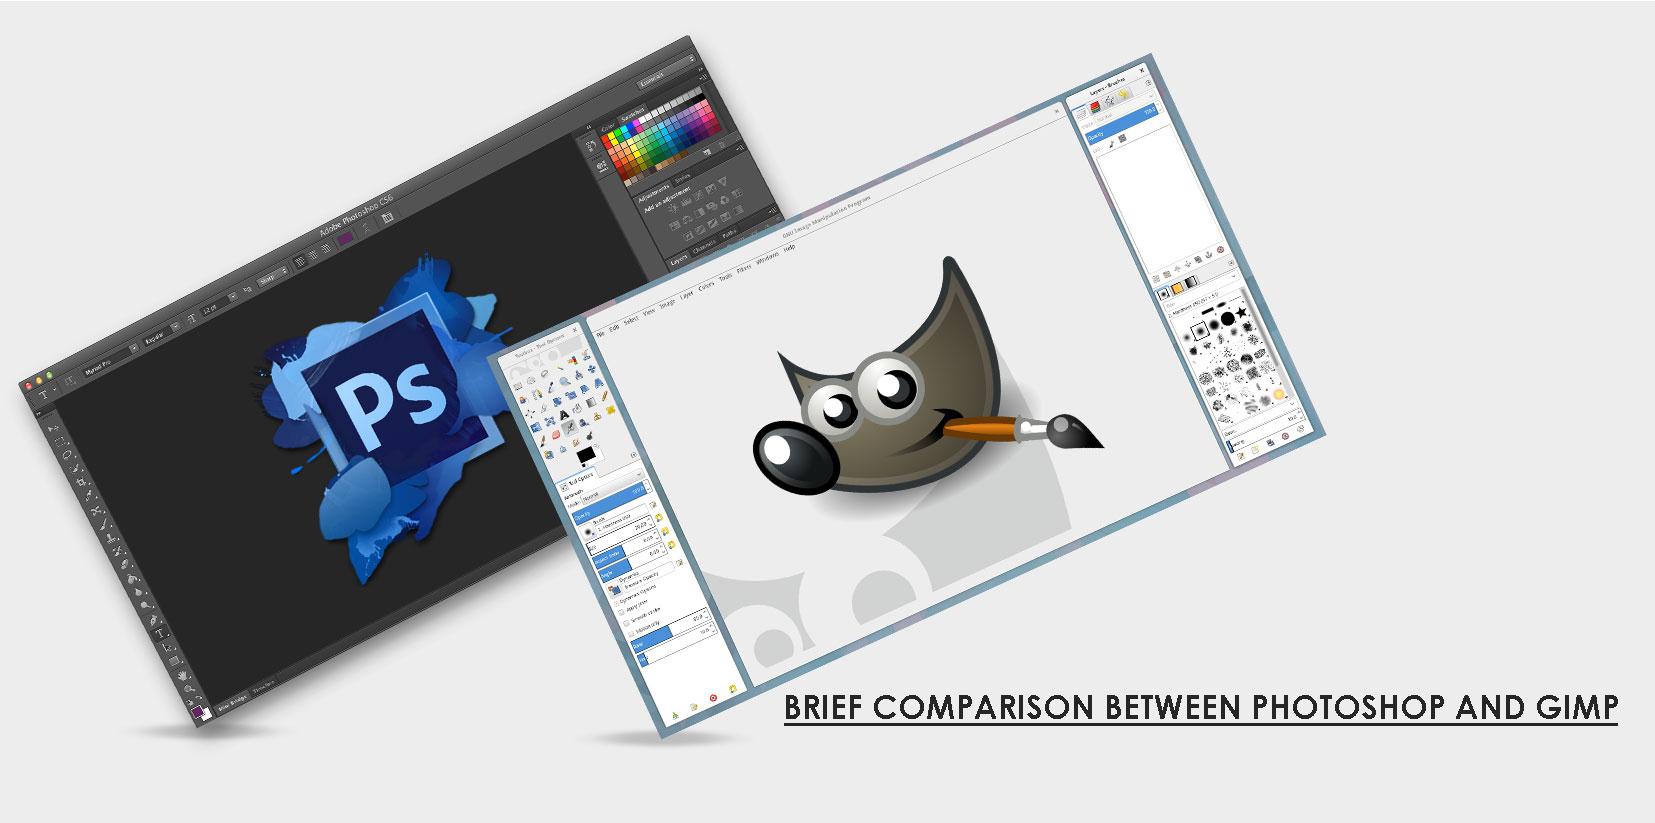 Adobe Photoshop vs. GIMP.